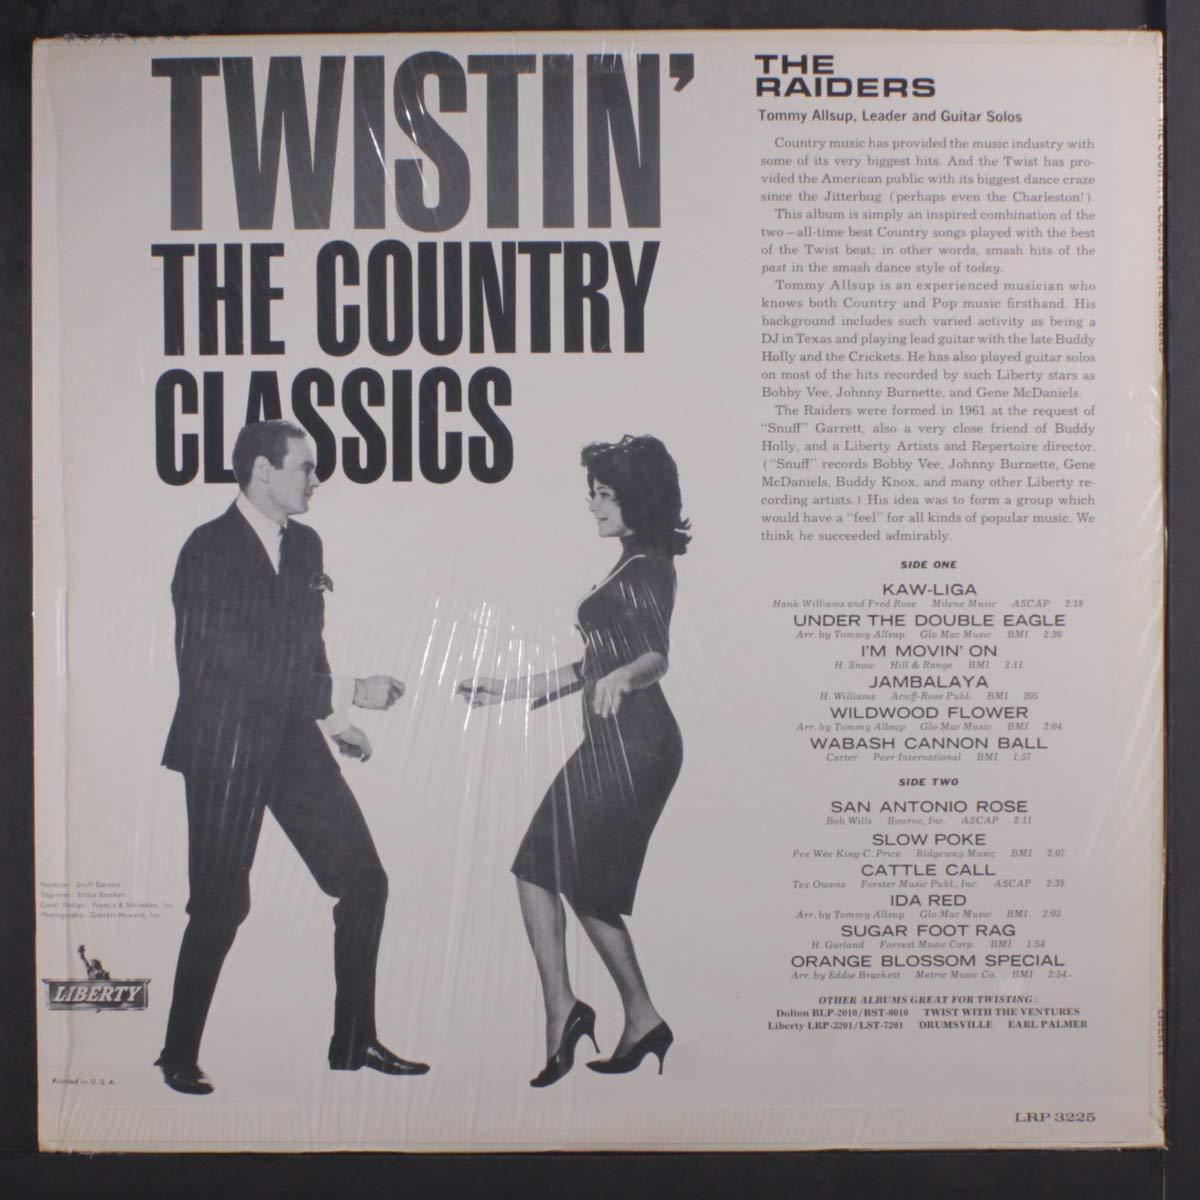 Raiders Twistin The Country Classics Amazon Com Music Upload date nov 24, 2020. amazon com